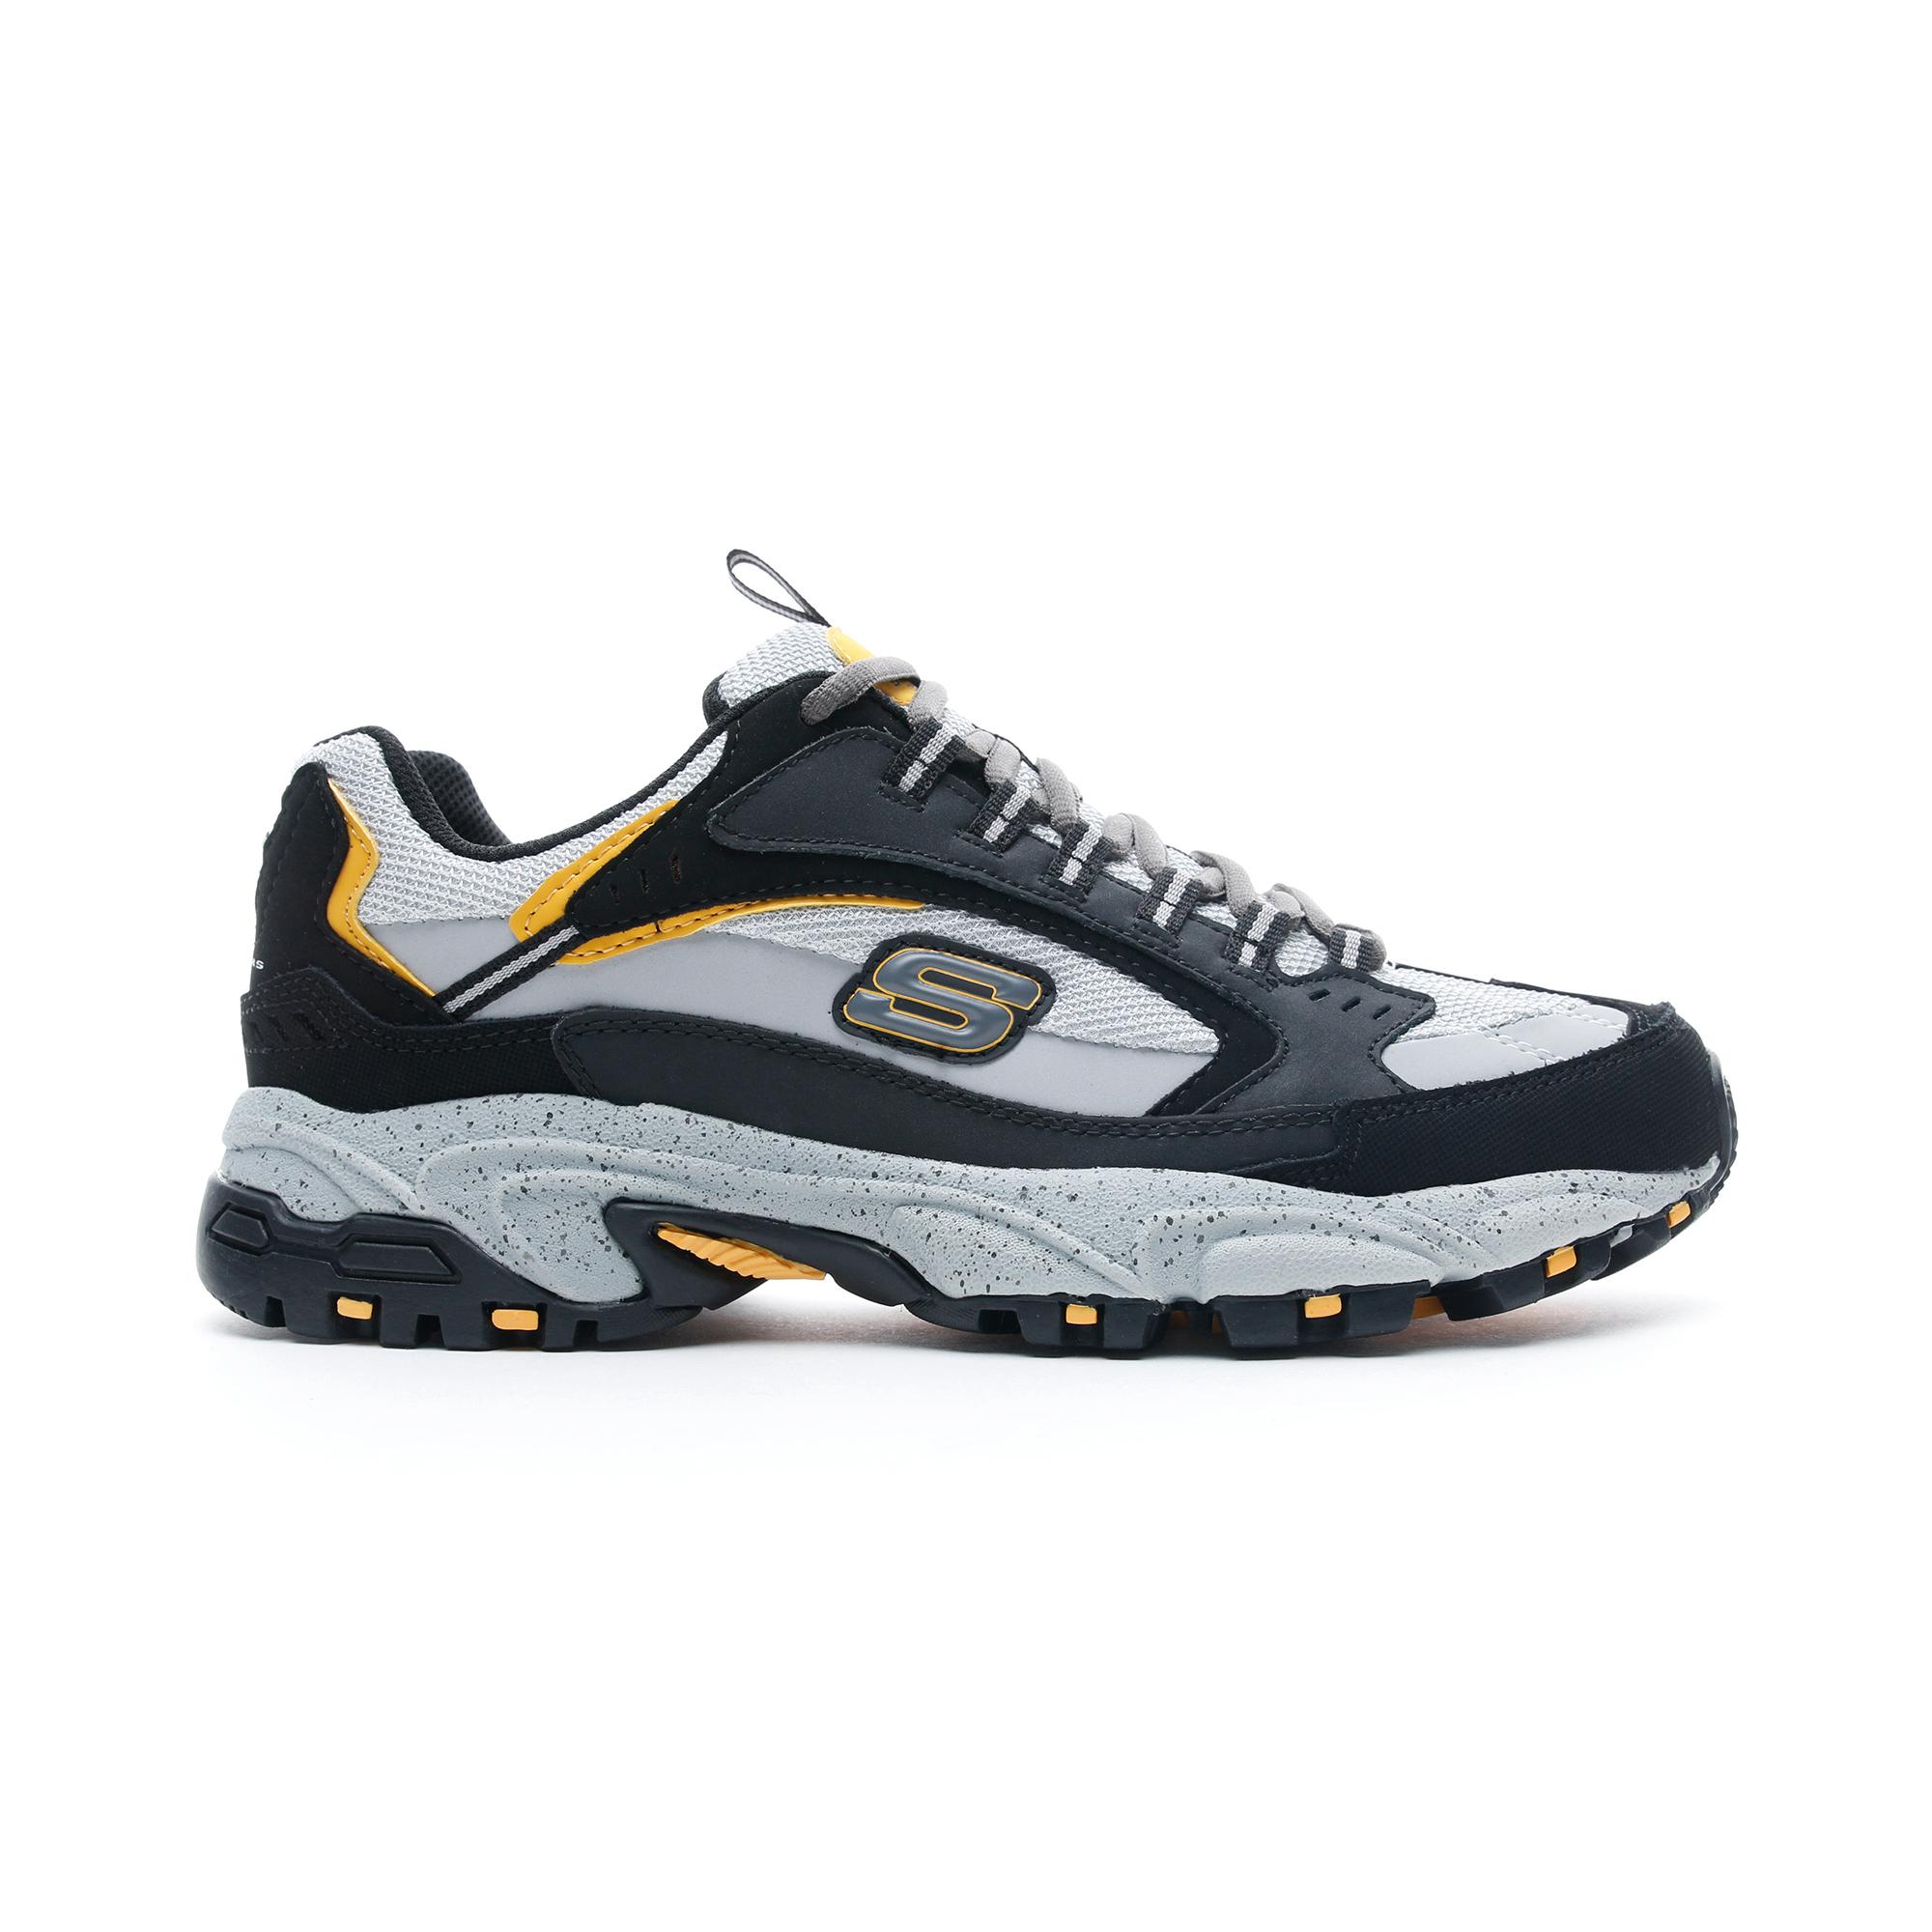 Skechers Stamina Gri - Siyah Erkek Spor Ayakkabı